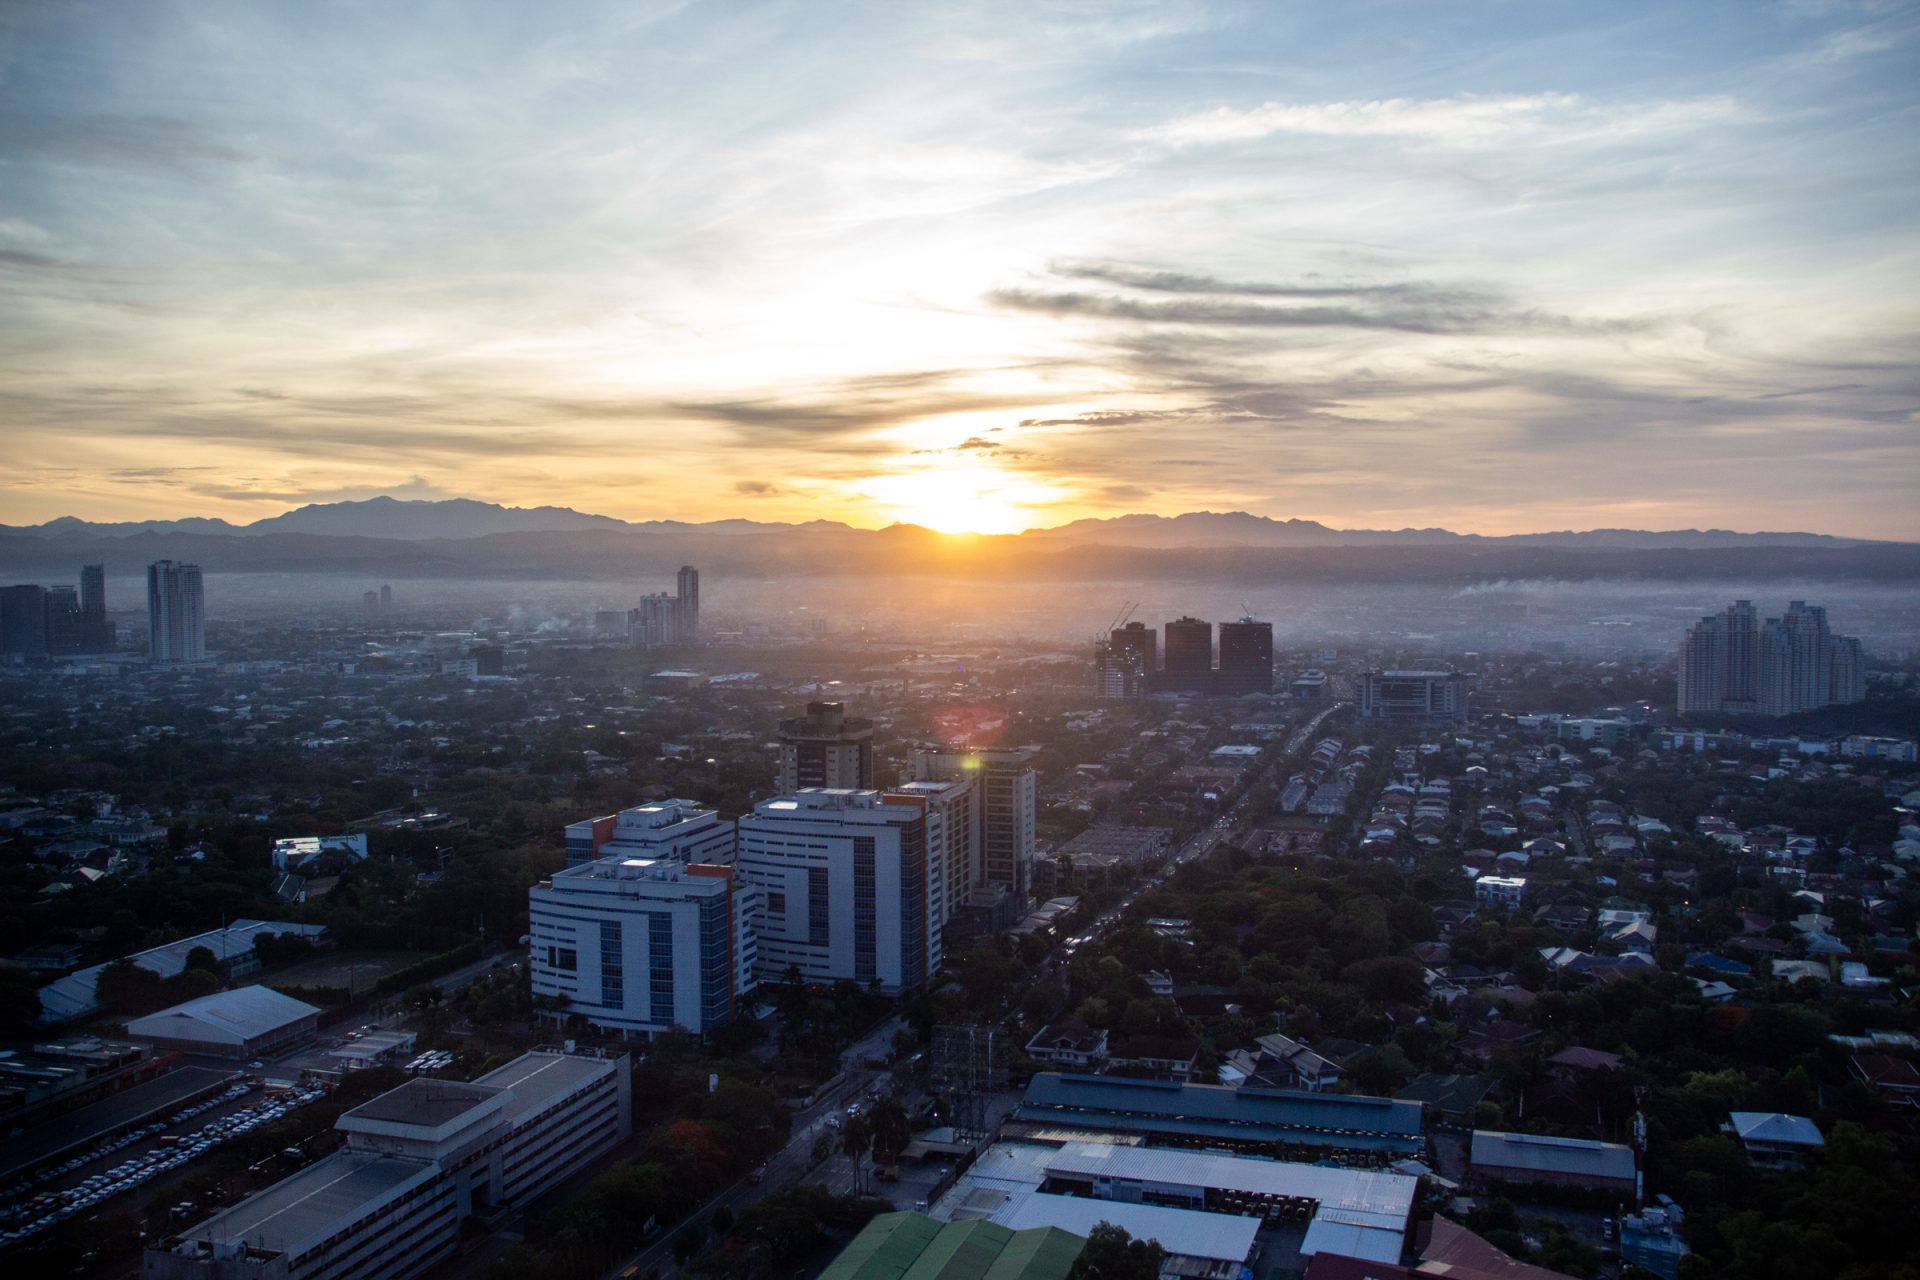 Sun Behind Mountains Beyond Urban Area